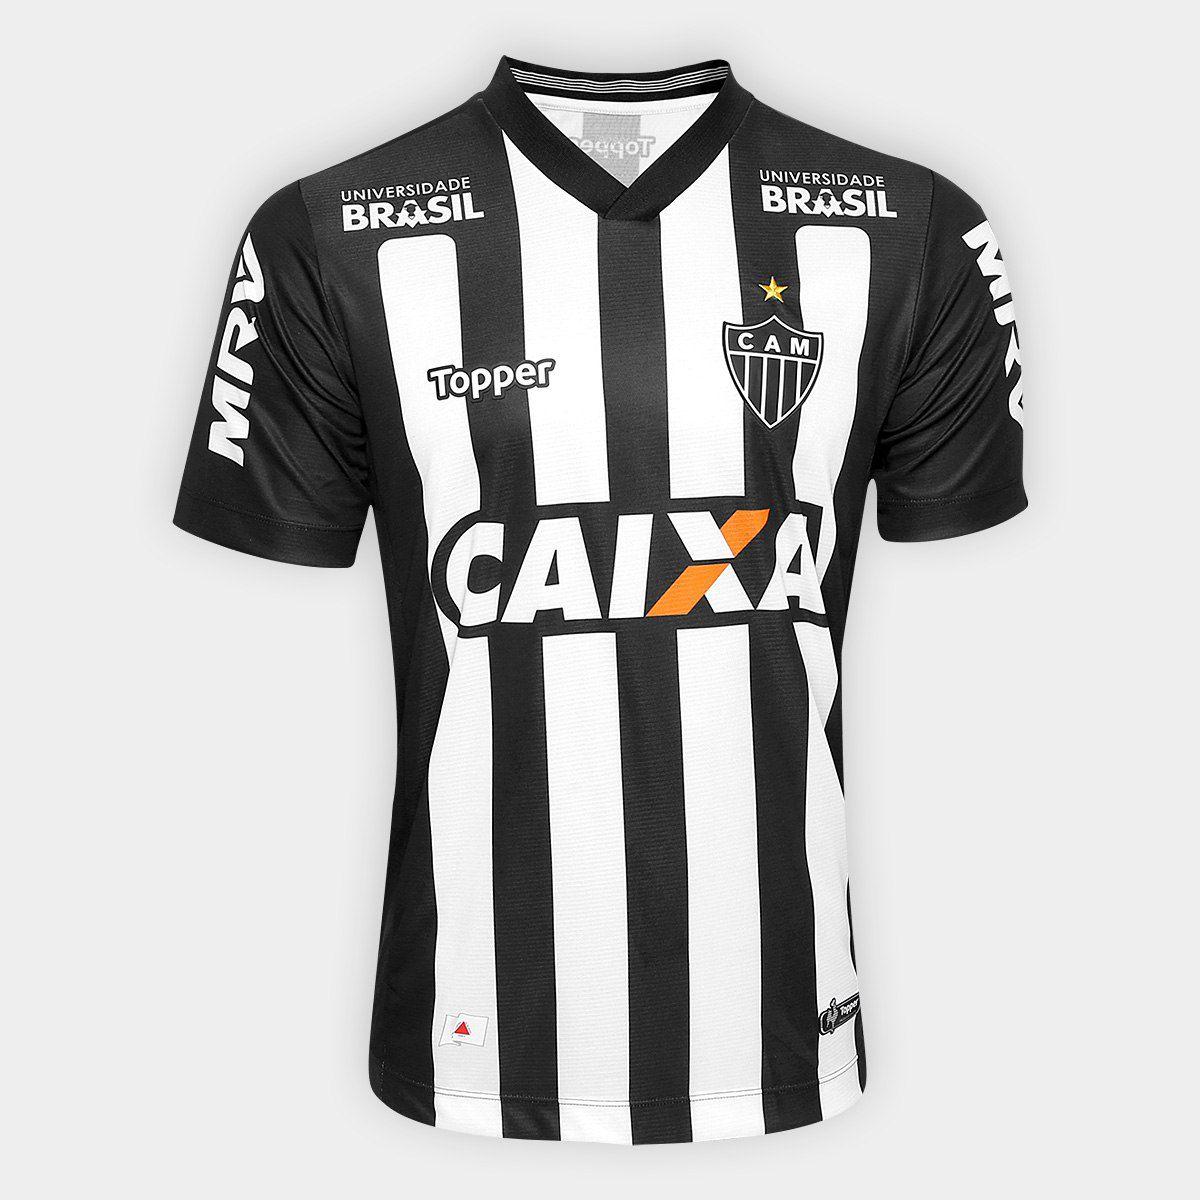 5ba033d7d7 Camisa Atlético Mineiro 2018 S Nº Topper Masculina - Energia Esportes